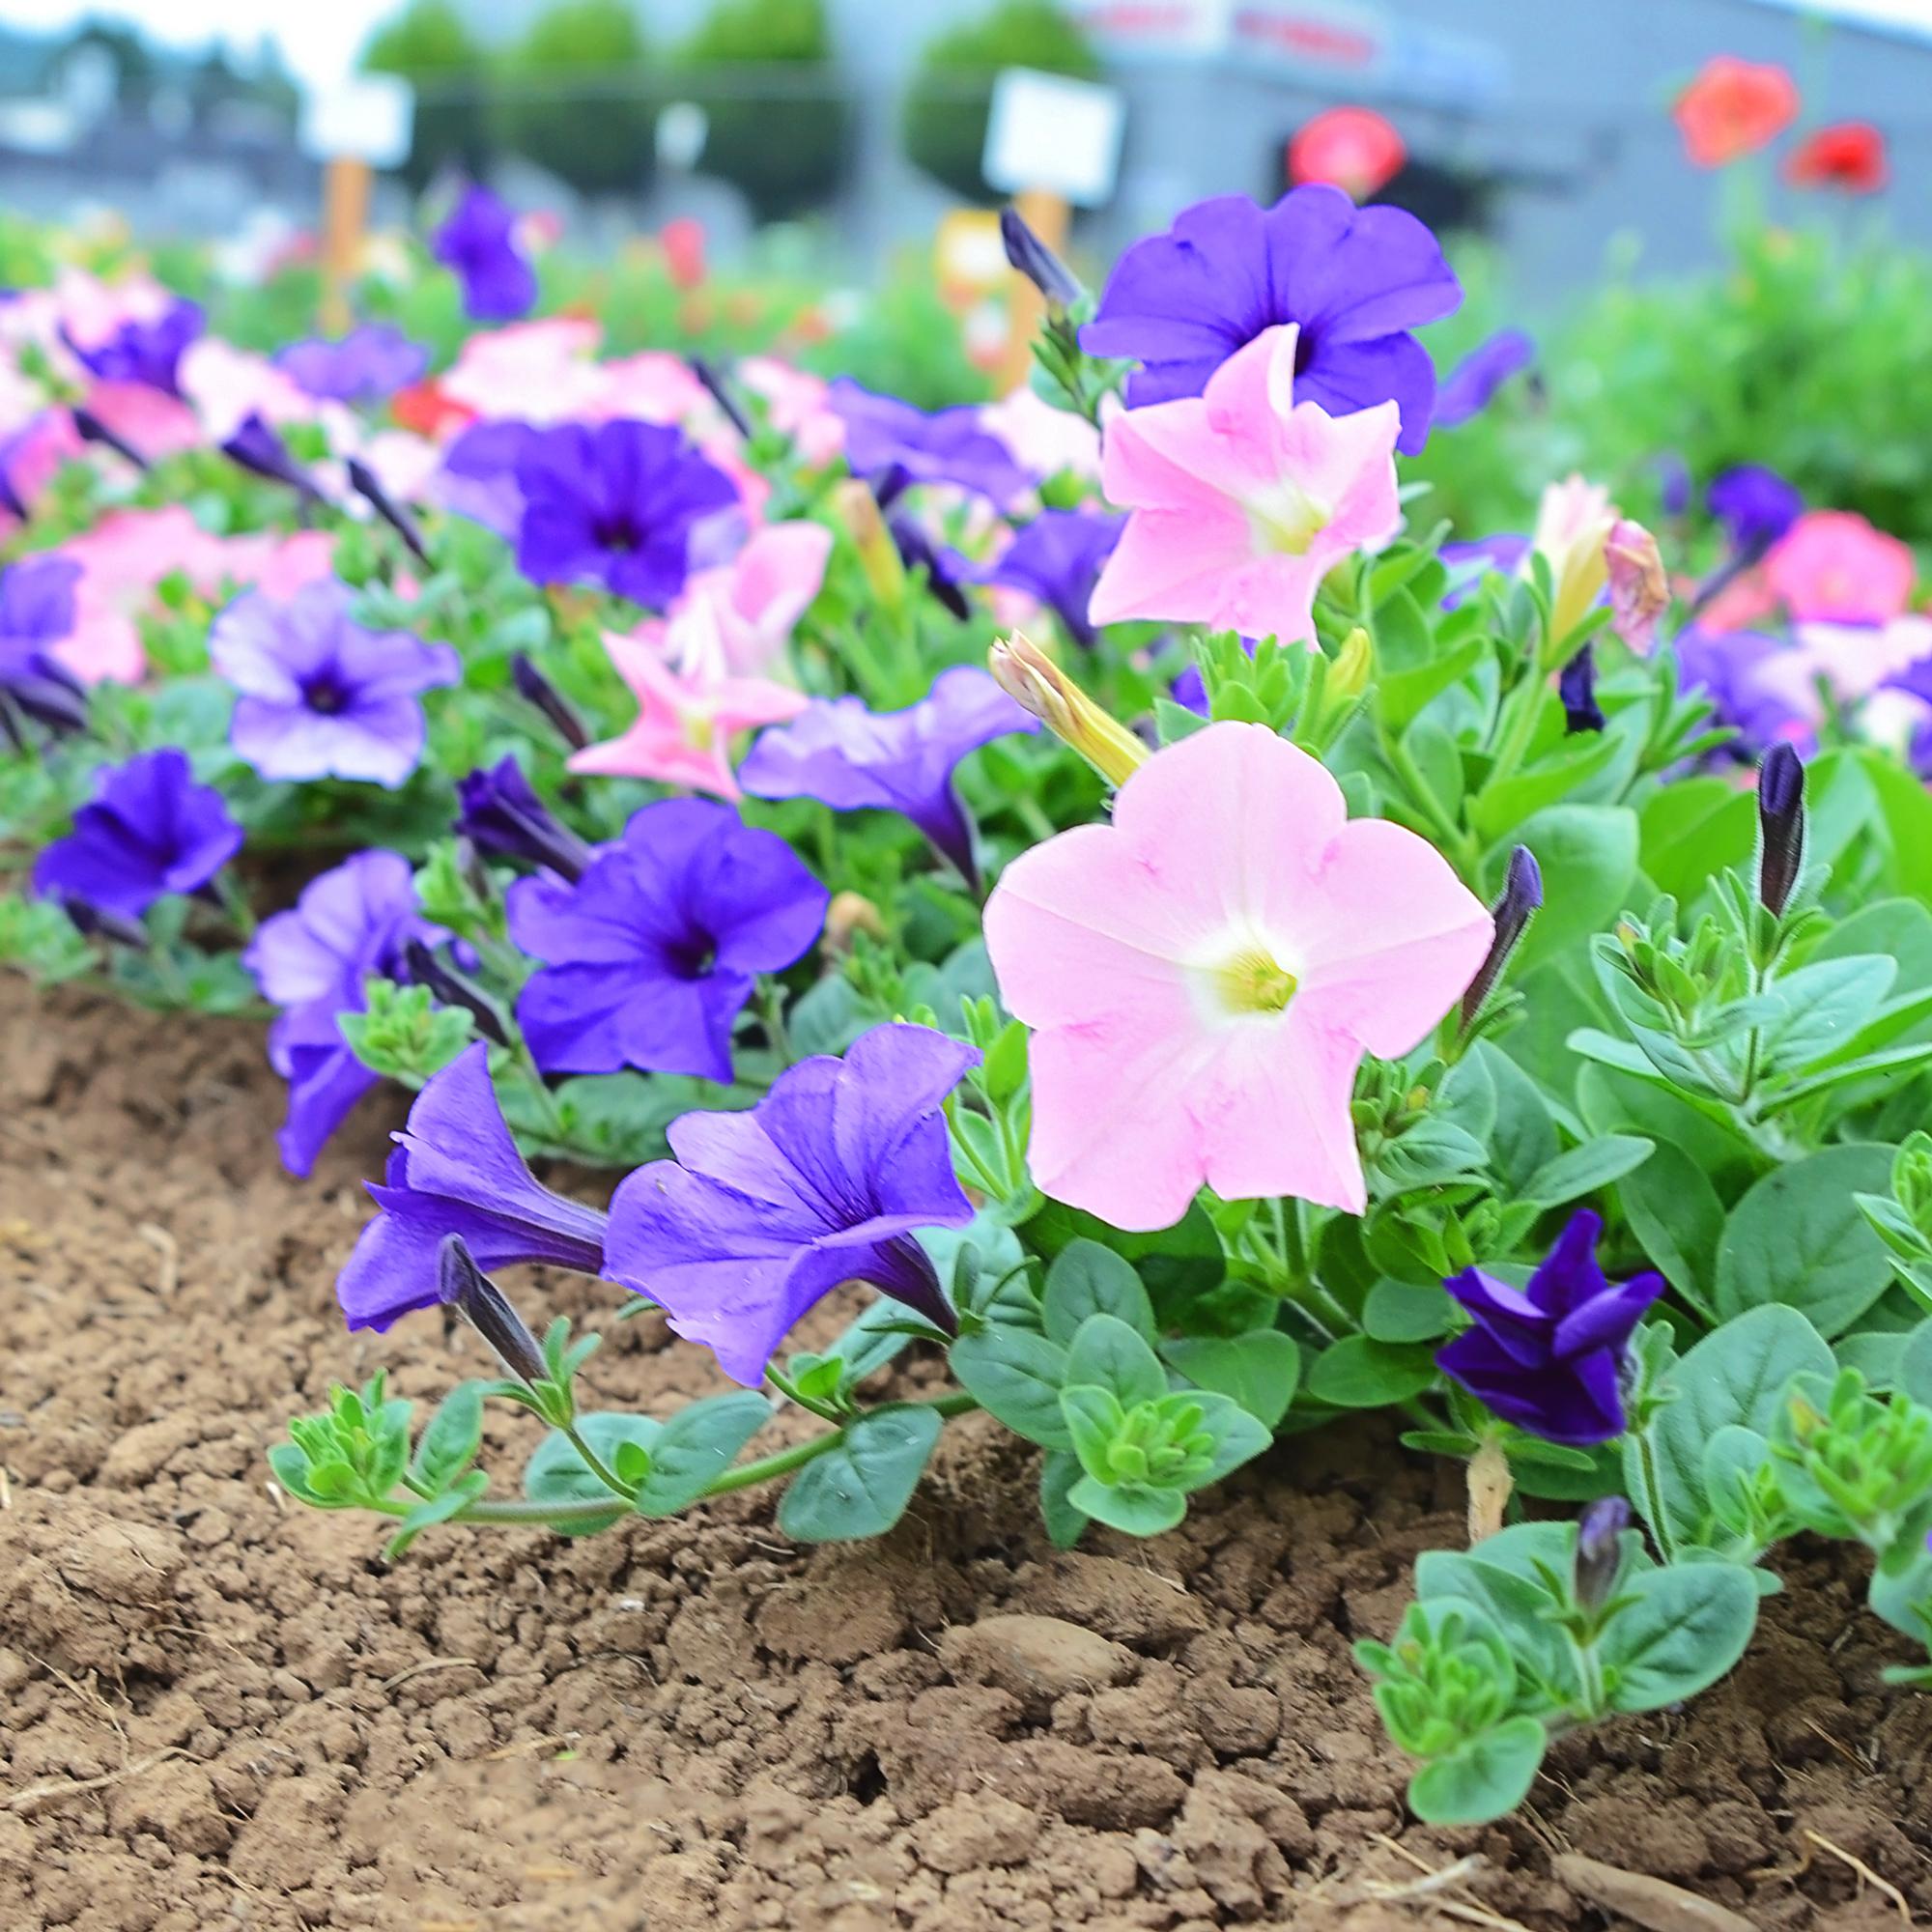 petunia-flower-trials-07-25-16.jpg